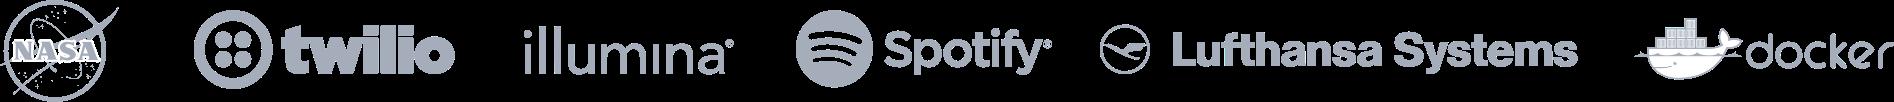 overview-customer-logo-strip